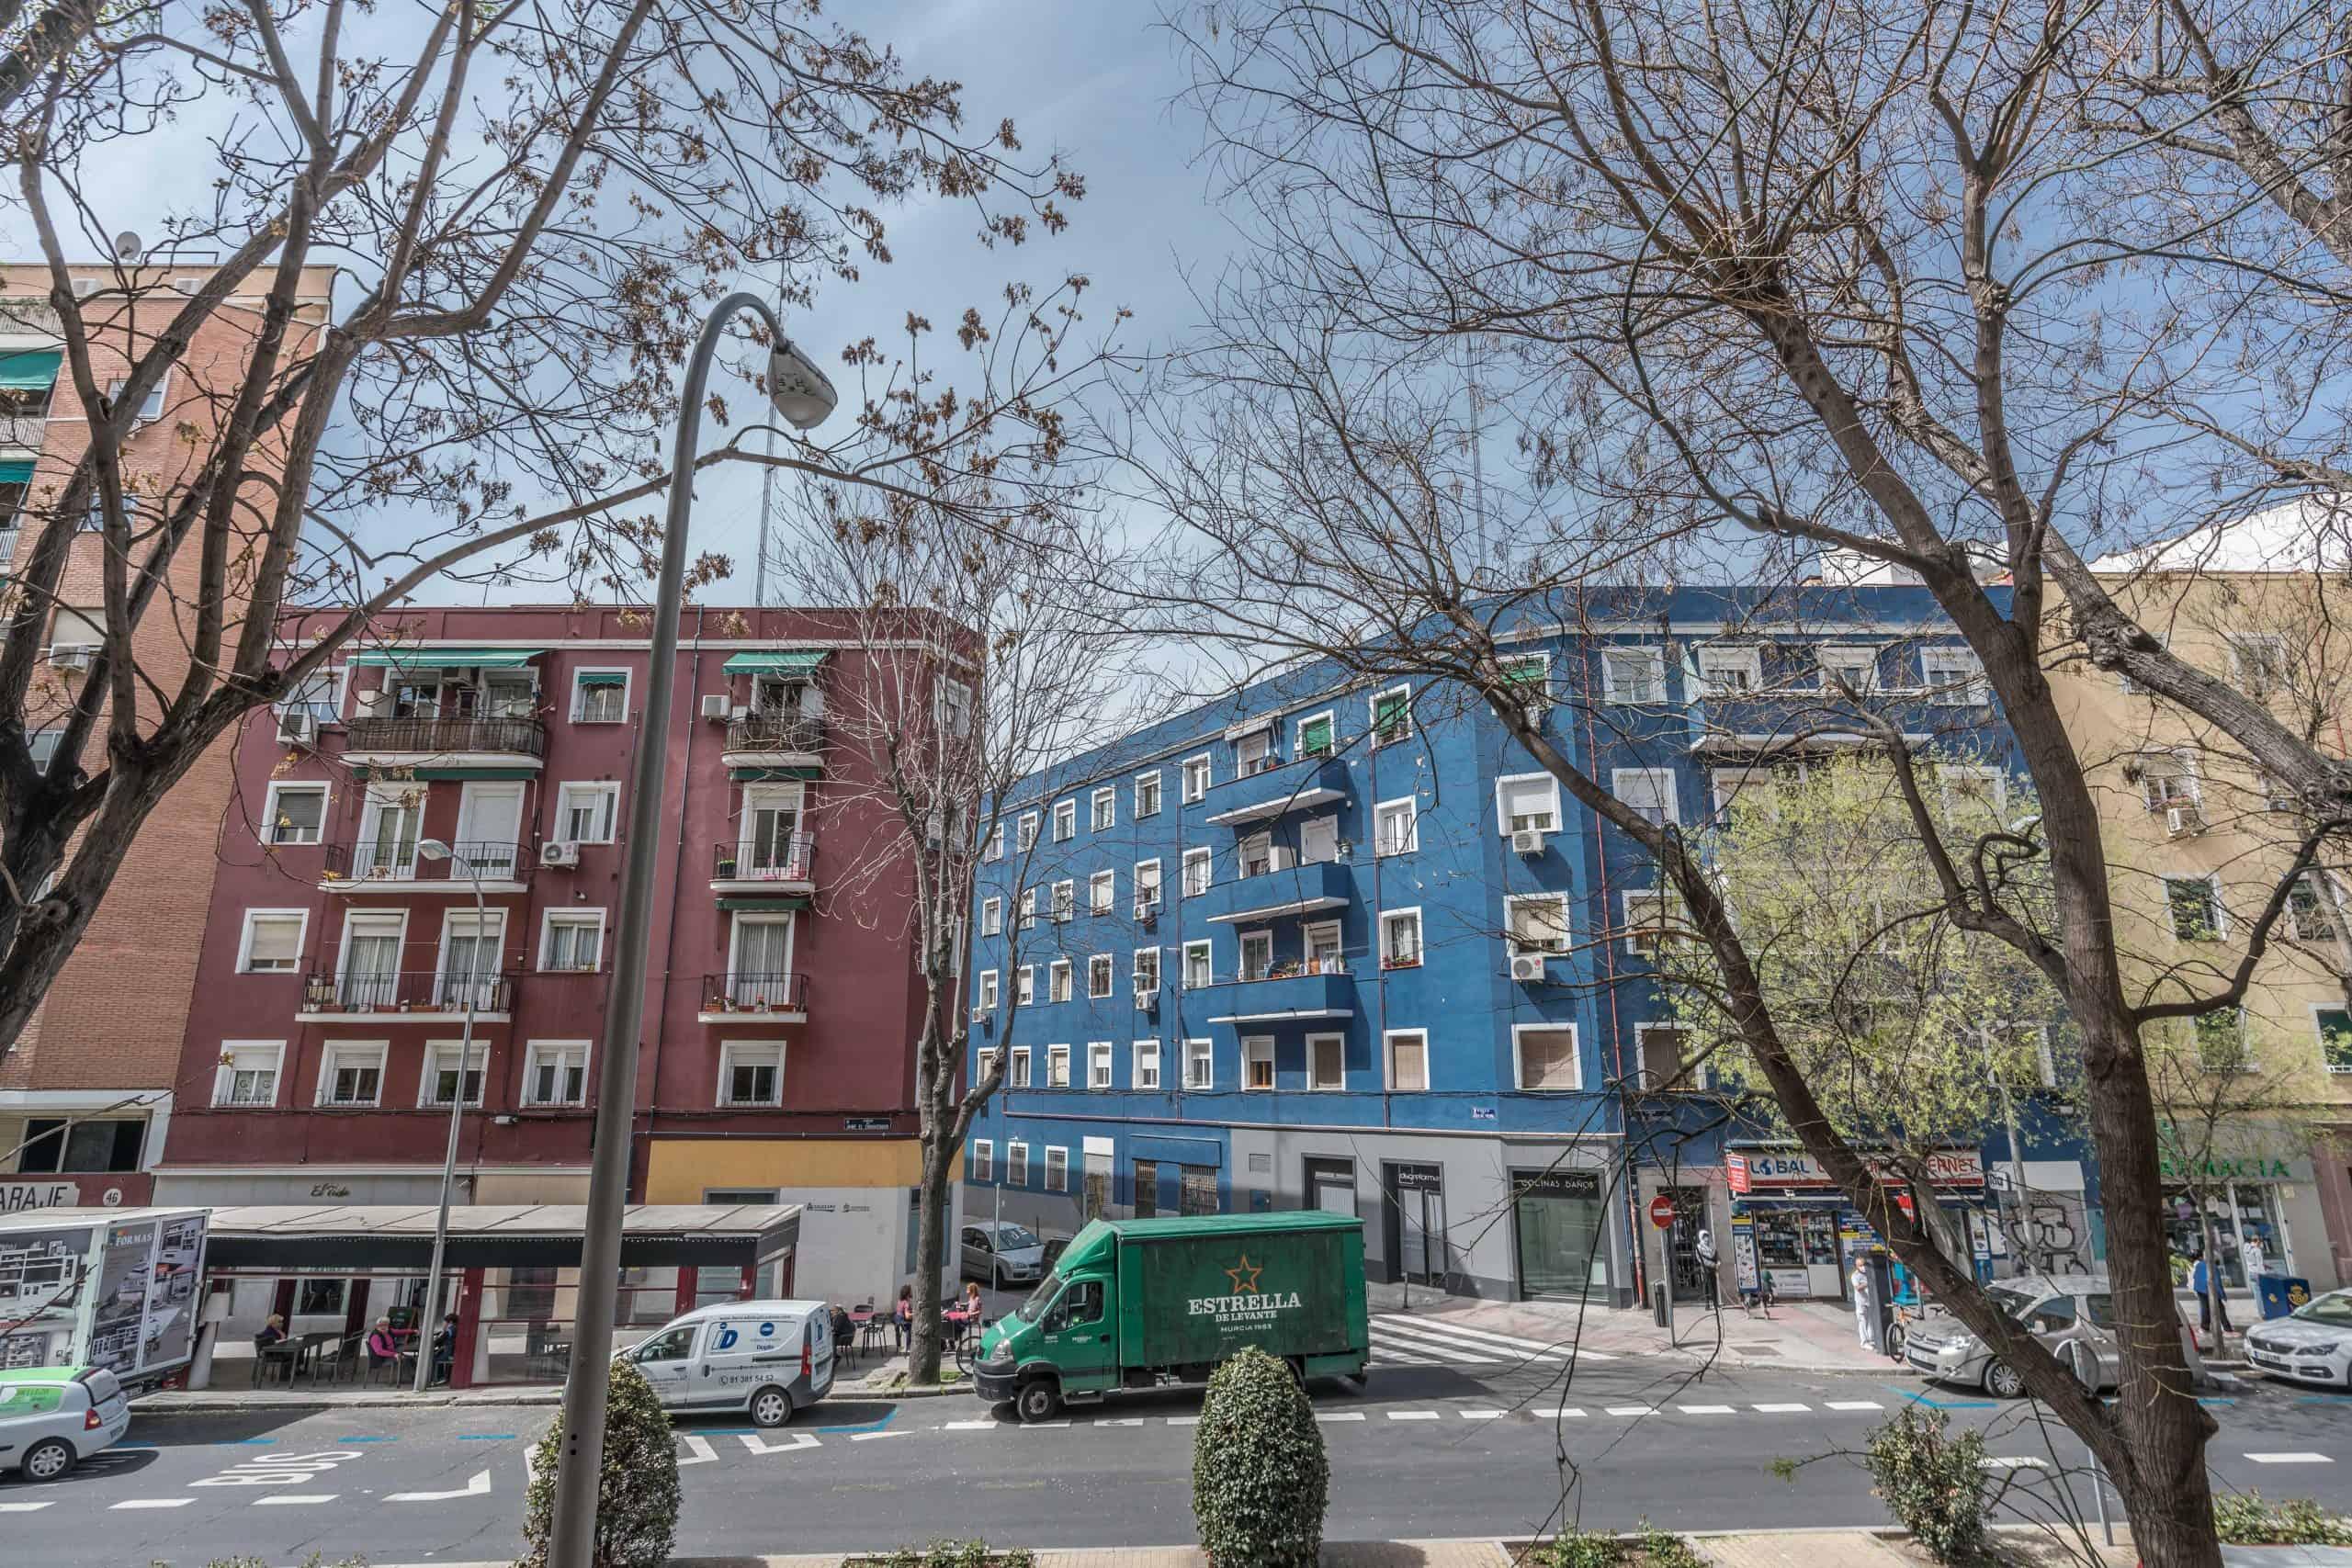 Agencia Inmobiliaria de Madrid-FUTUROCASA-Zona ARGANZUELA-LEGAZPI -calle Jaime Conquistador 27- Vistas 2